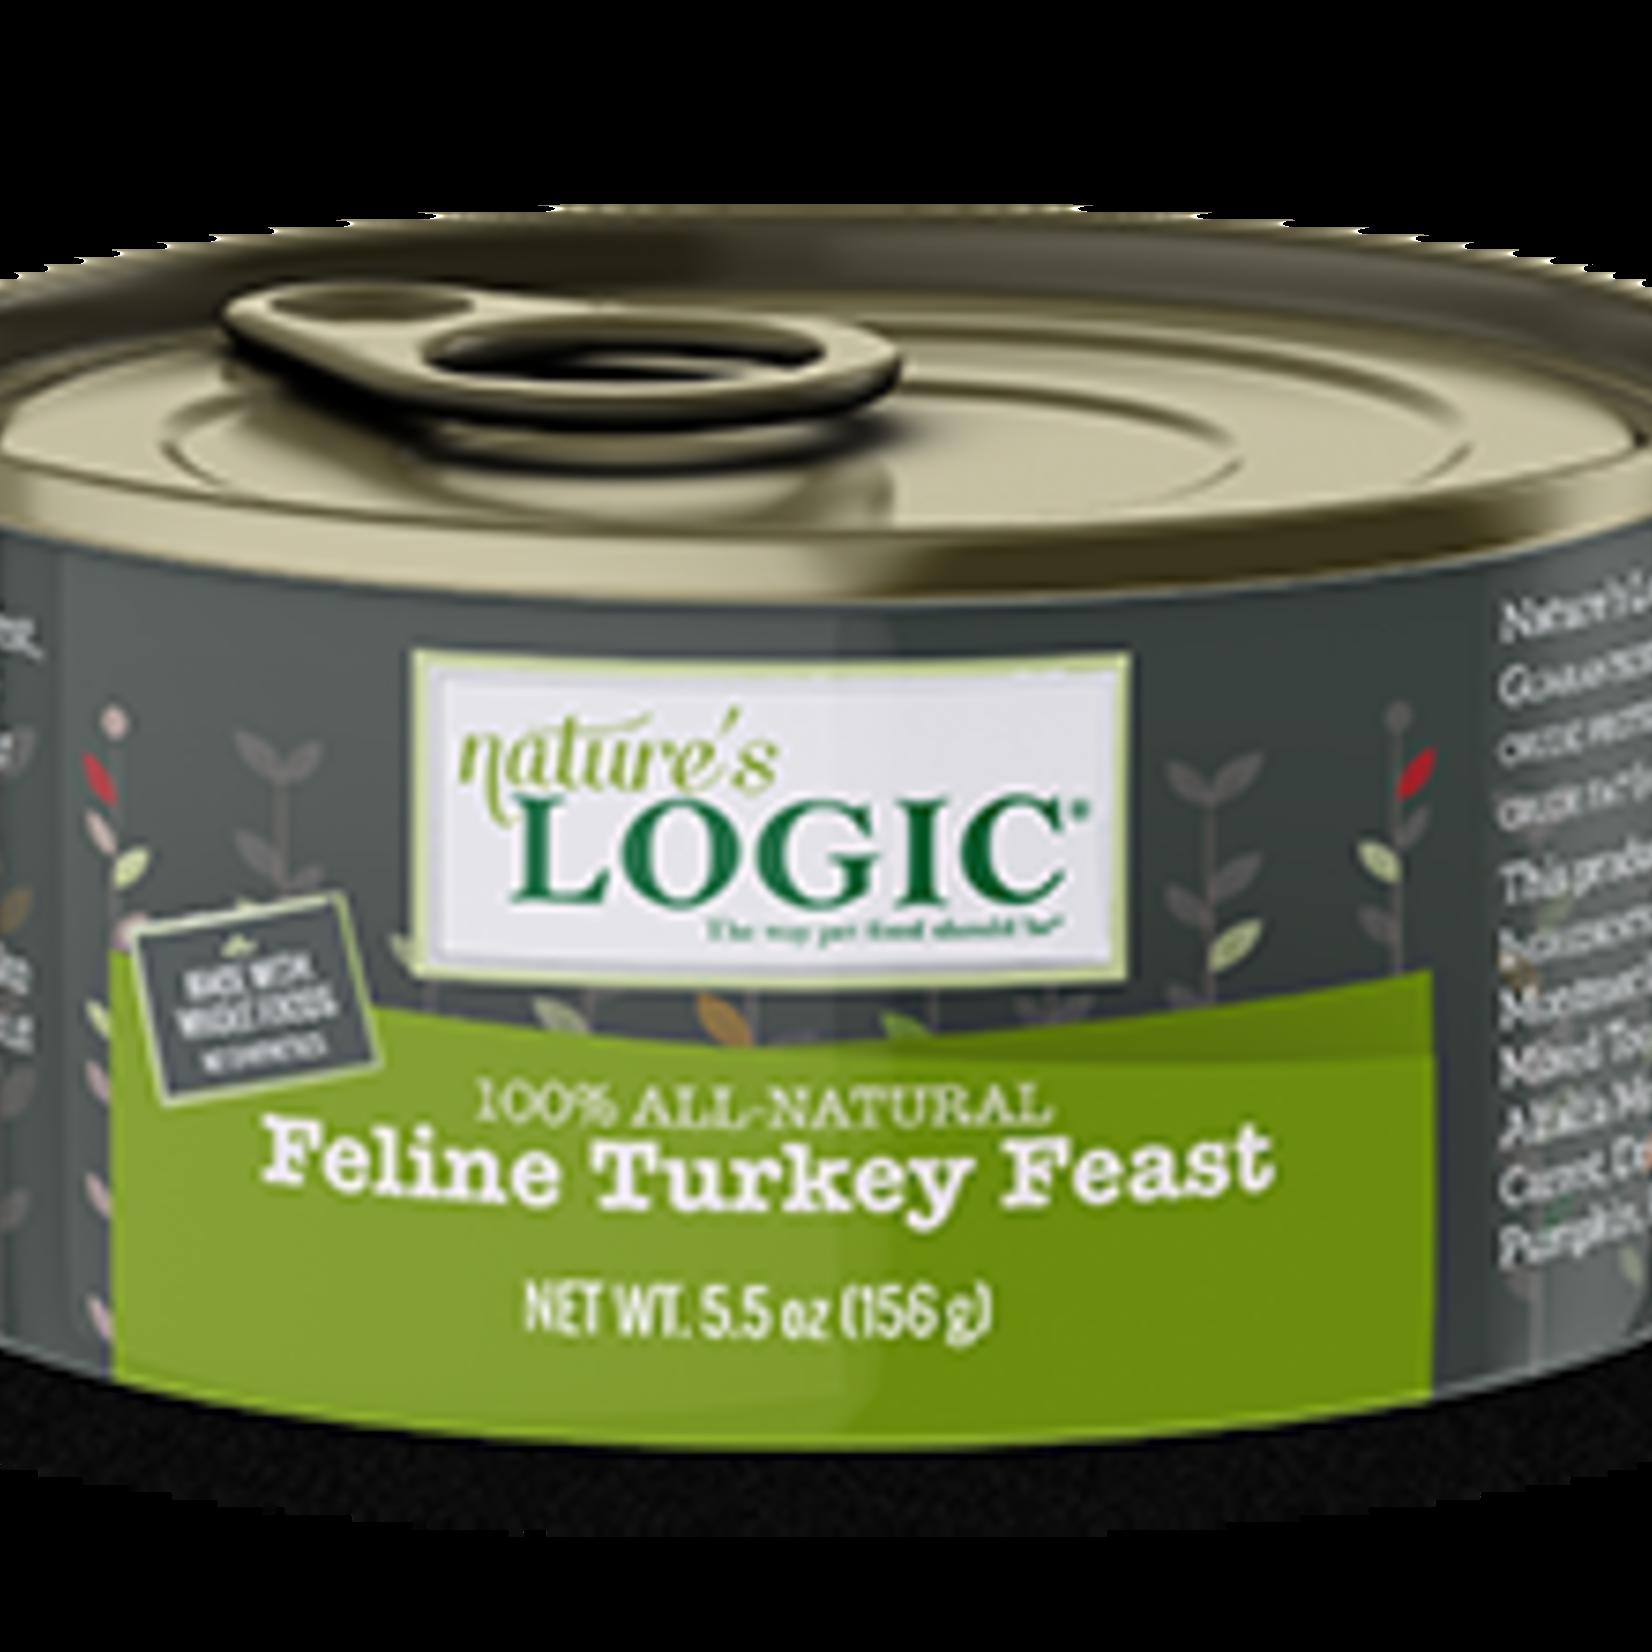 Natures Logic Natures Logic Cat Grain Free Turkey Feast 5.5 OZ